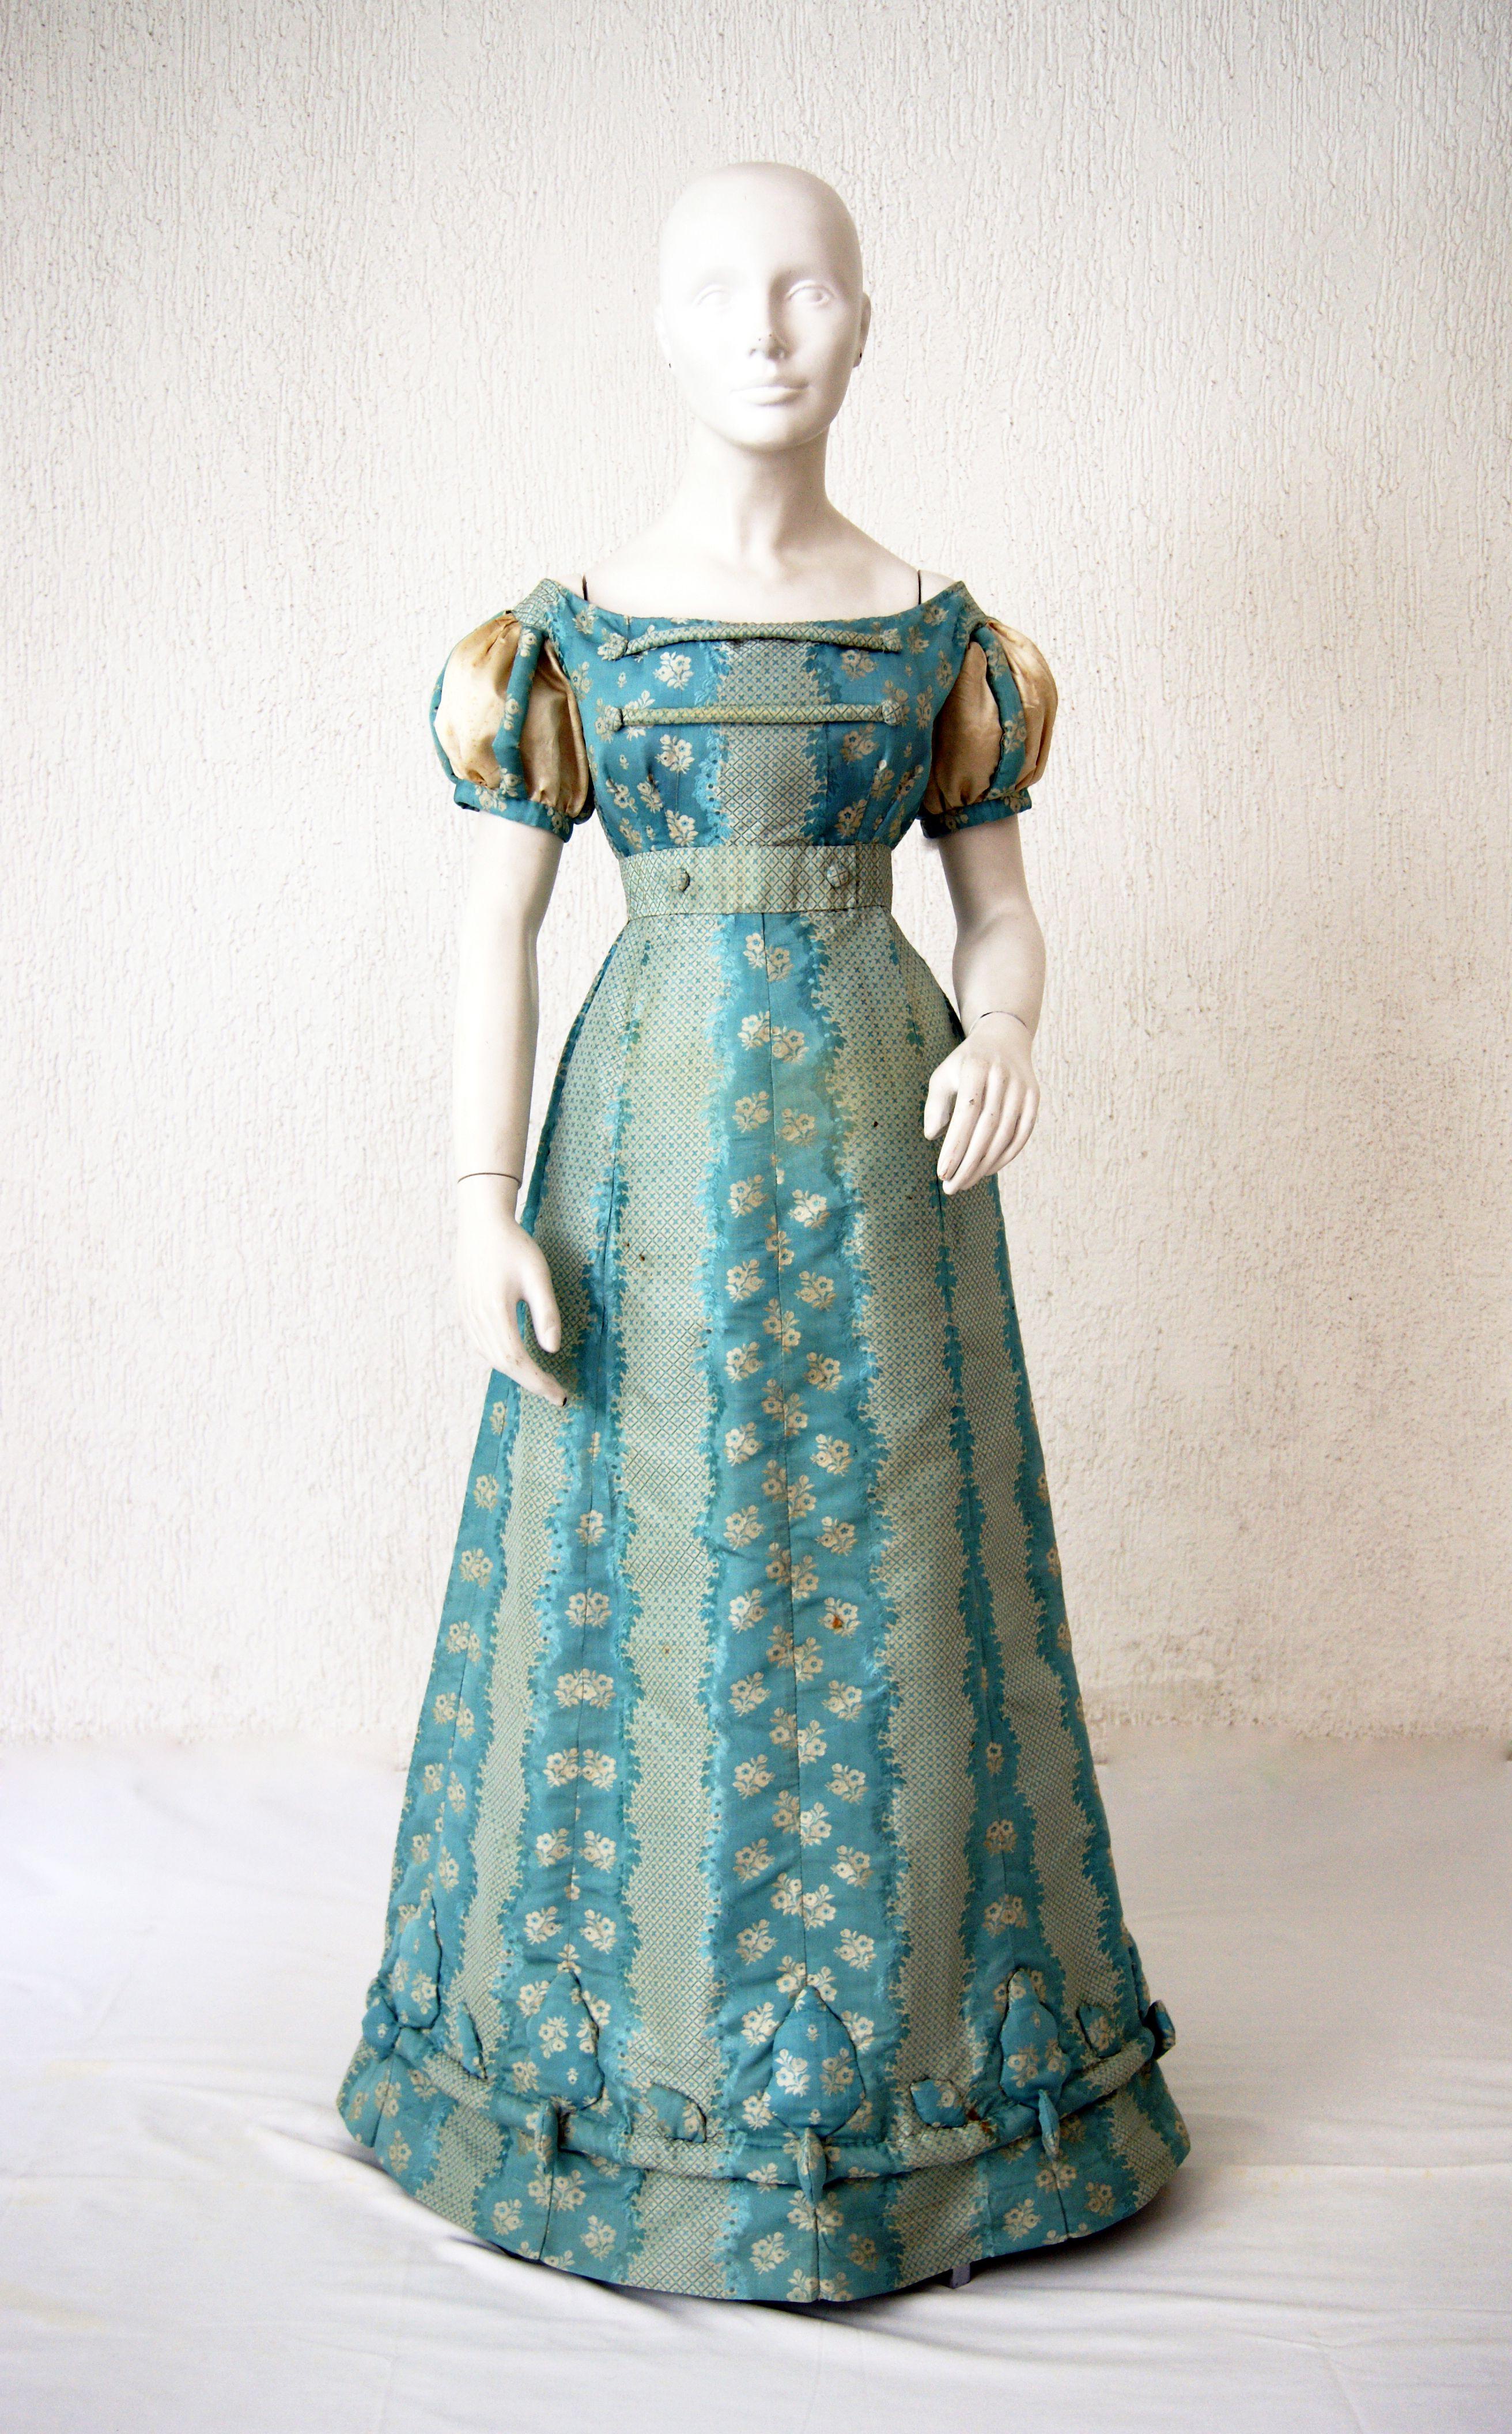 c. 3 Reception dress in silk taffeta printed with ornaments